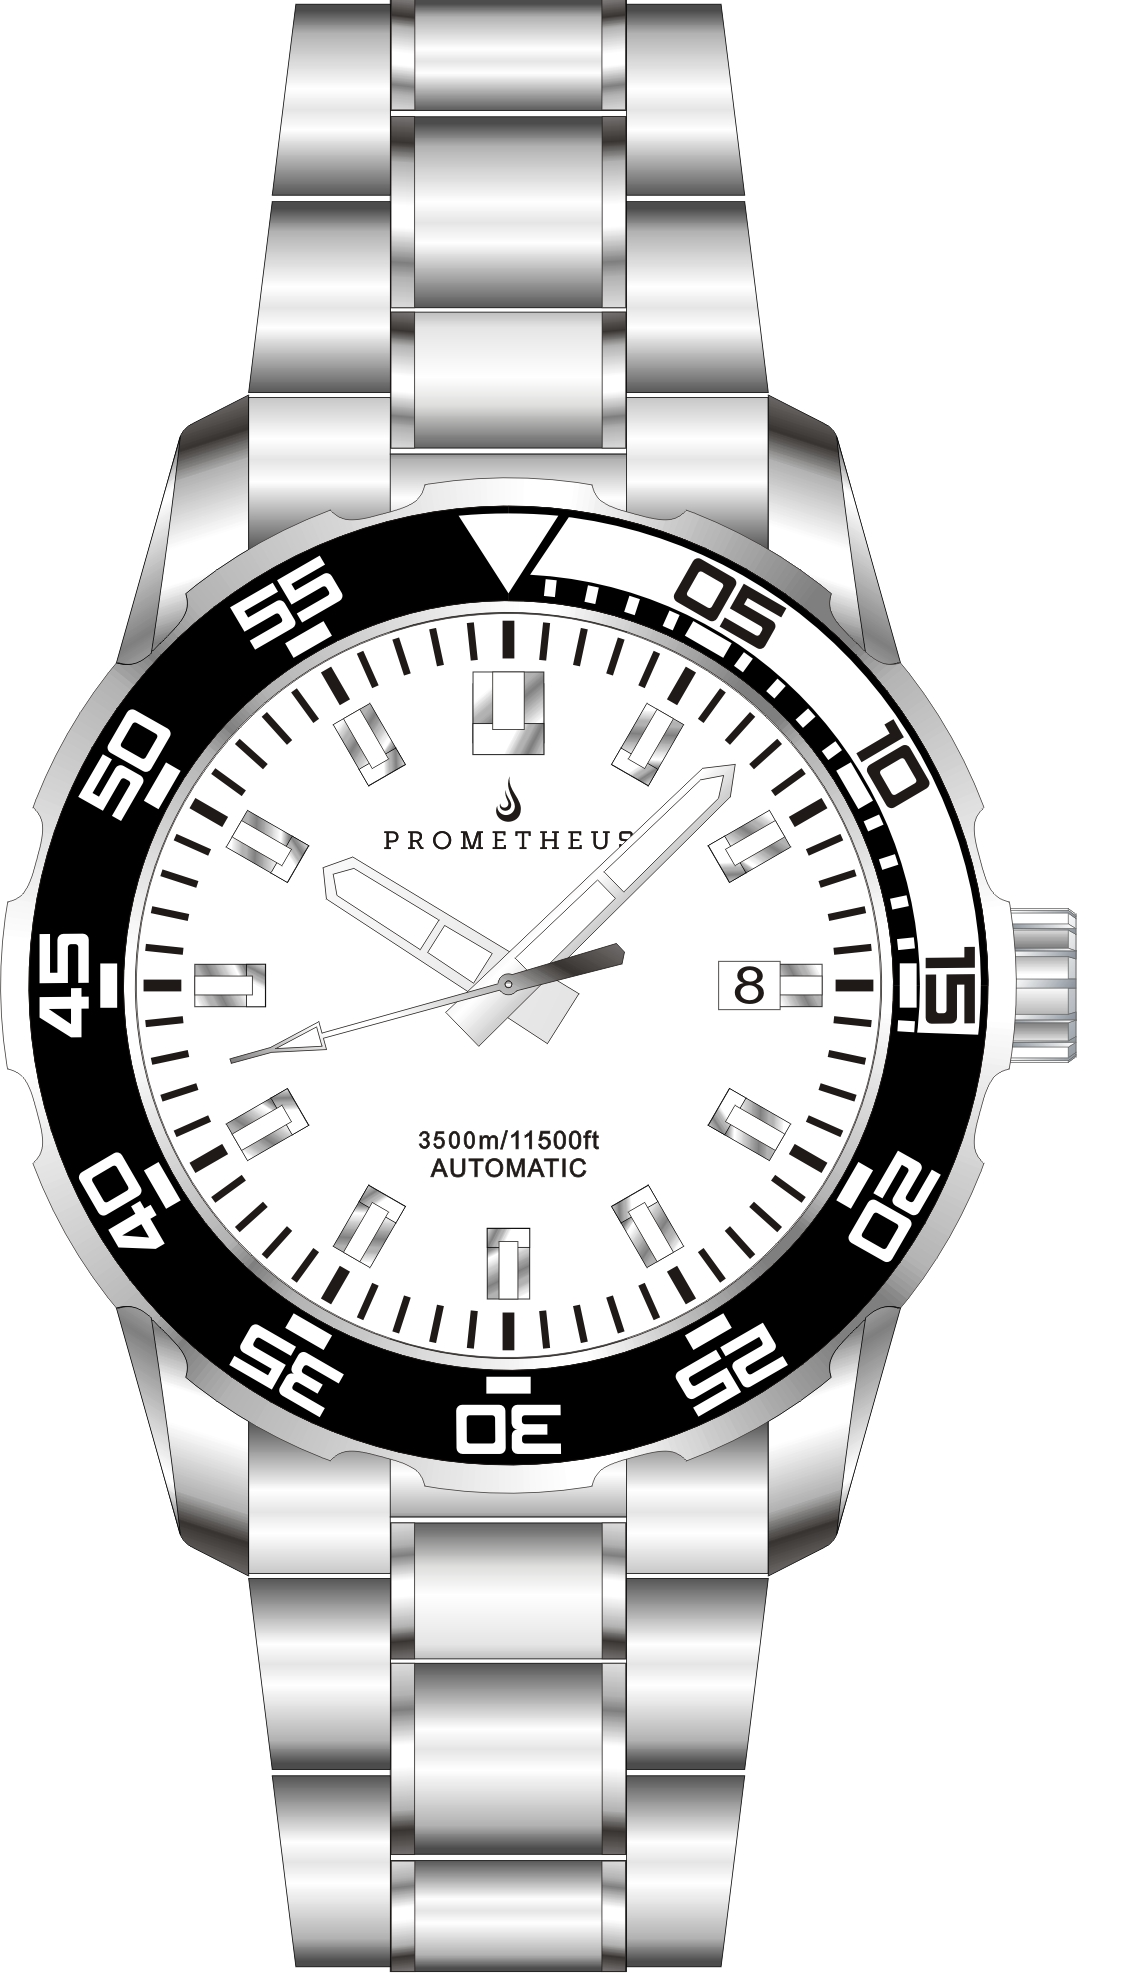 Prometheus Poseidon Stainless Steel White Bezel Lumed White Dial 3500m Miyota 9015 Automatic Diver Watch